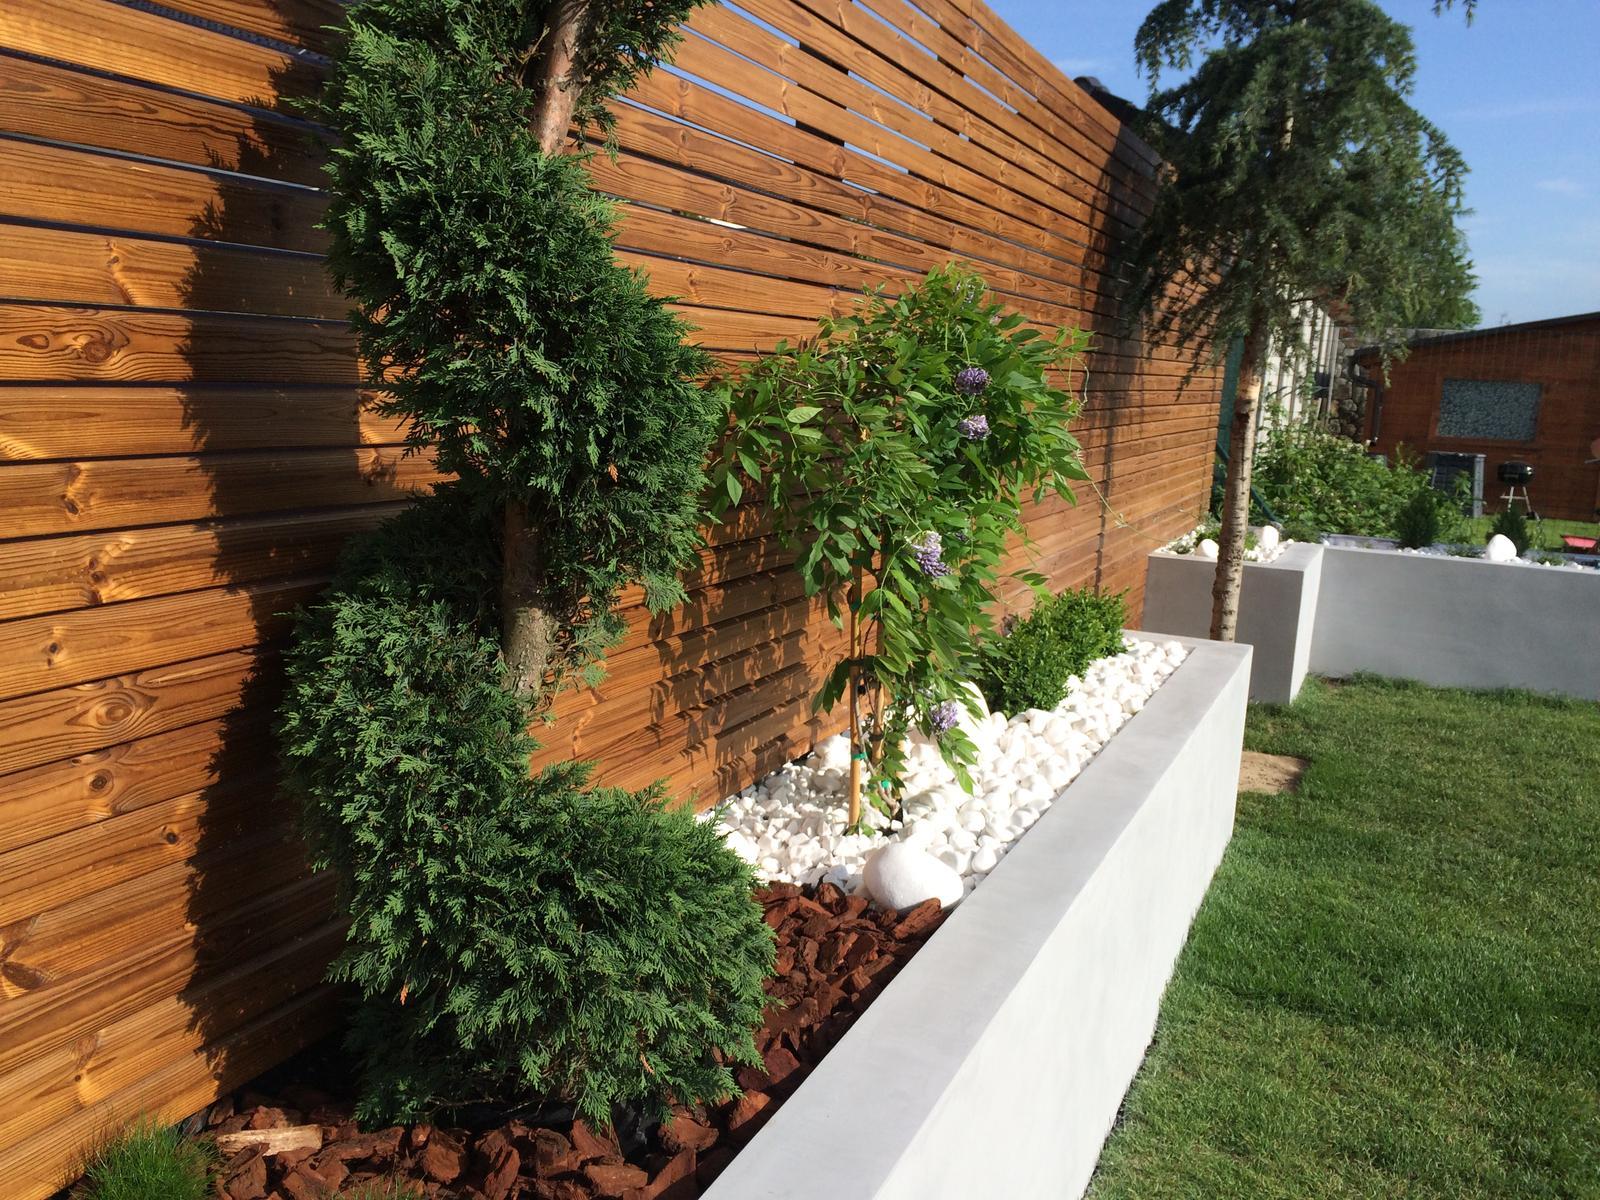 Zahradka - Obrázok č. 55